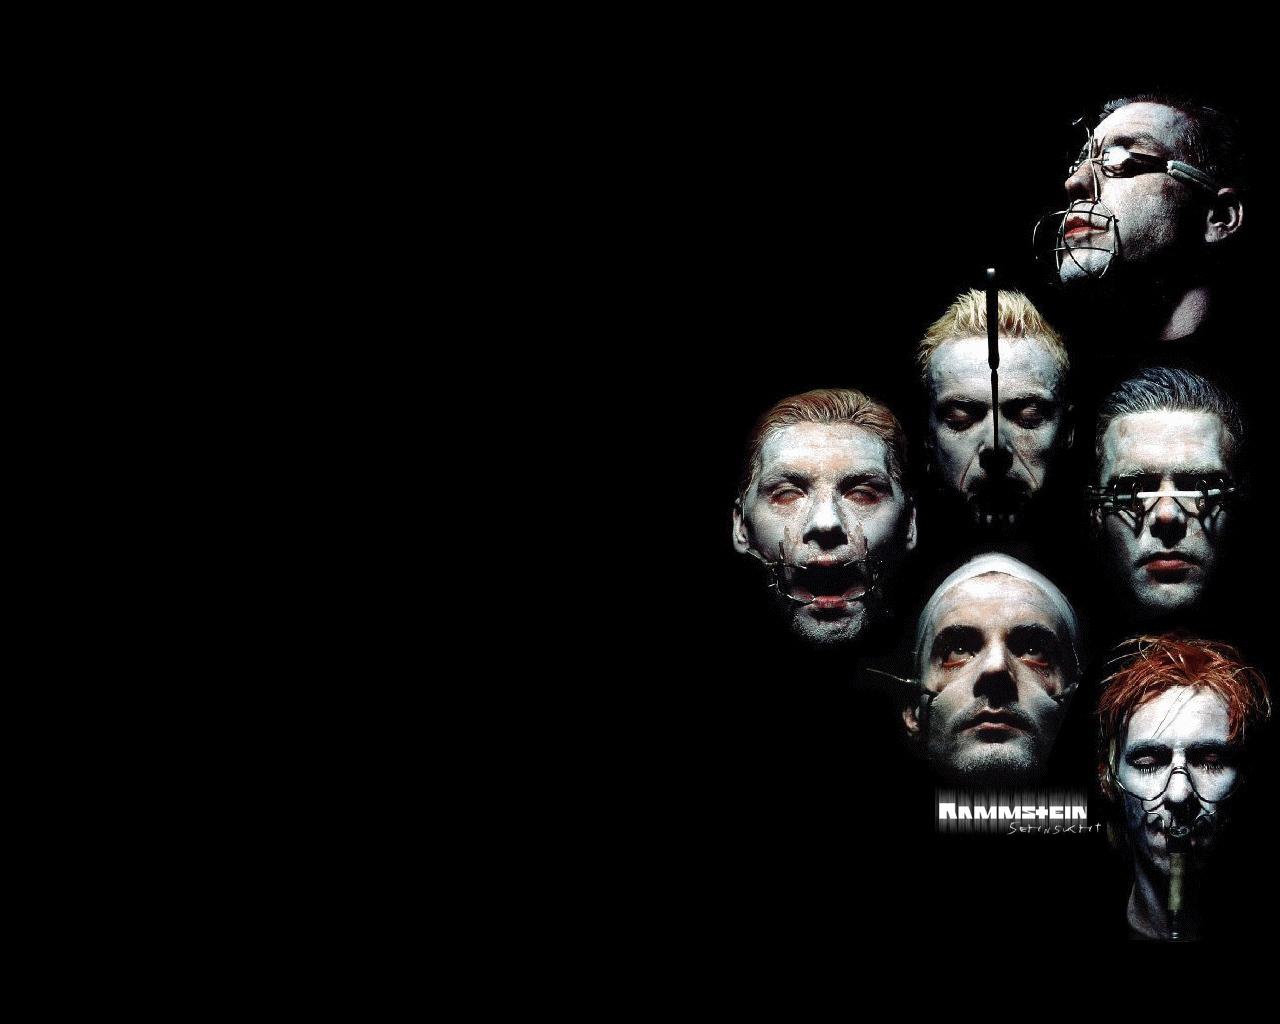 Rammstein Deadhead Right Wallpaper